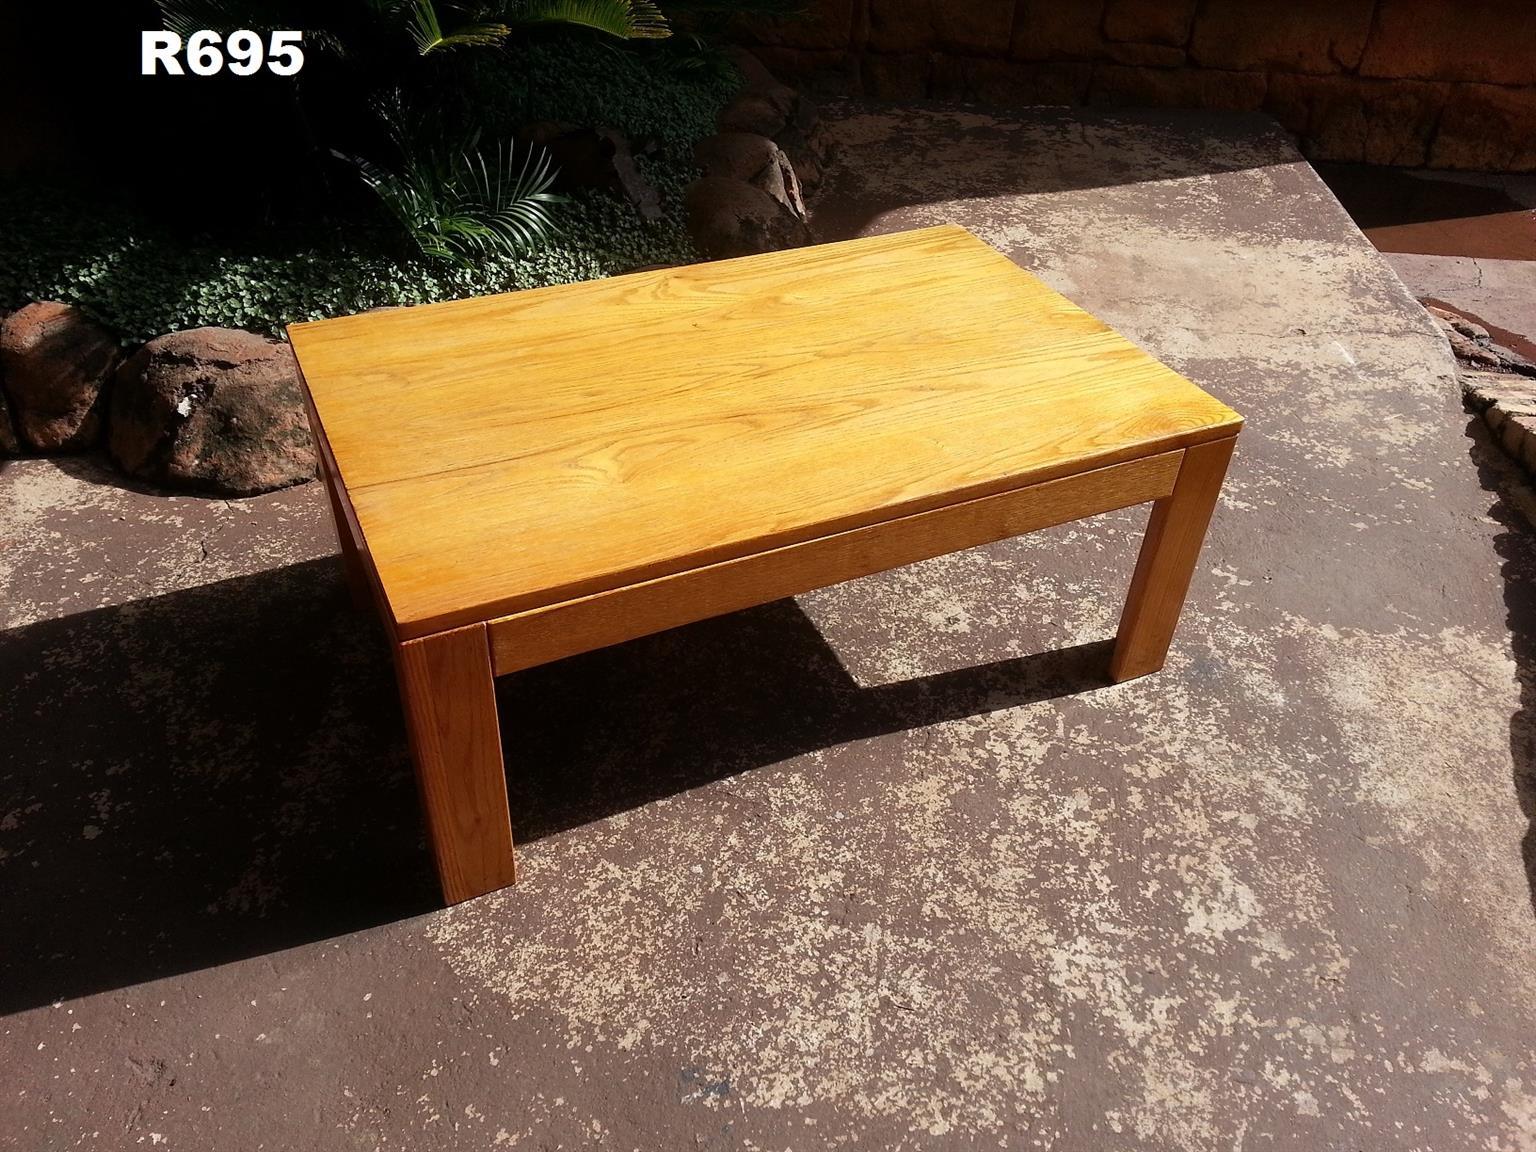 Medium Solid Oak Coffee Table (1000x640x410)